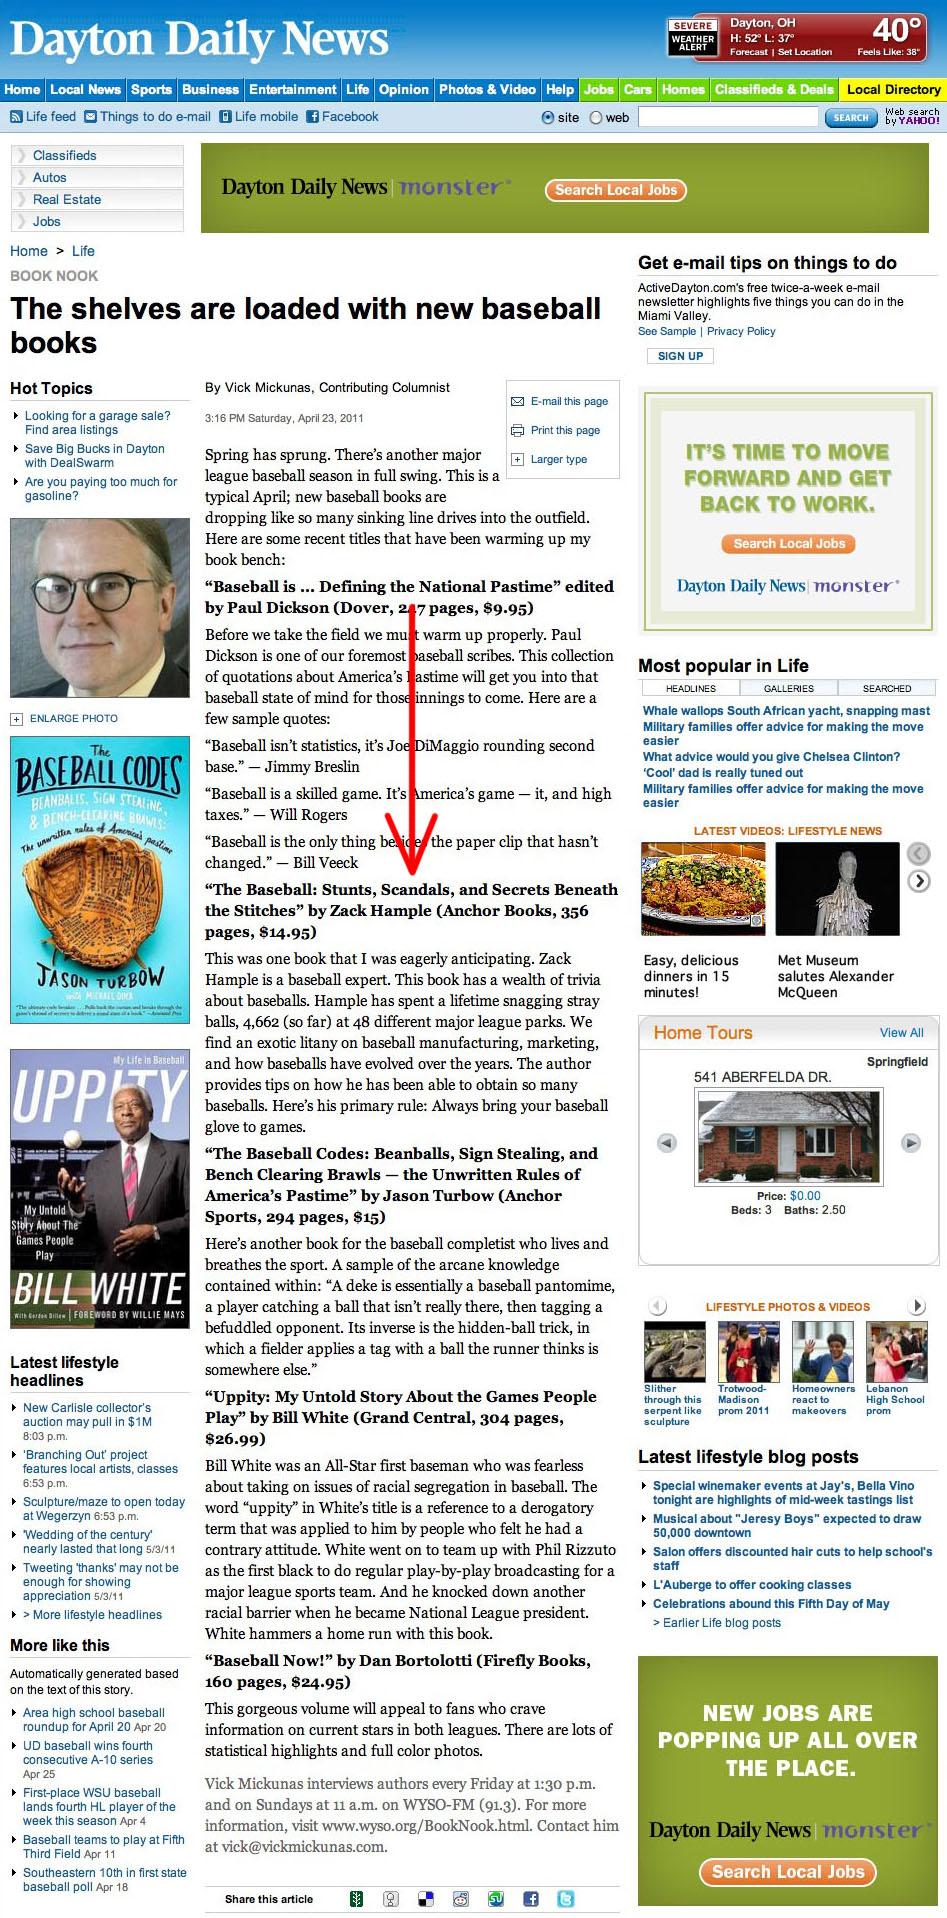 dayton_daily_news2.jpg